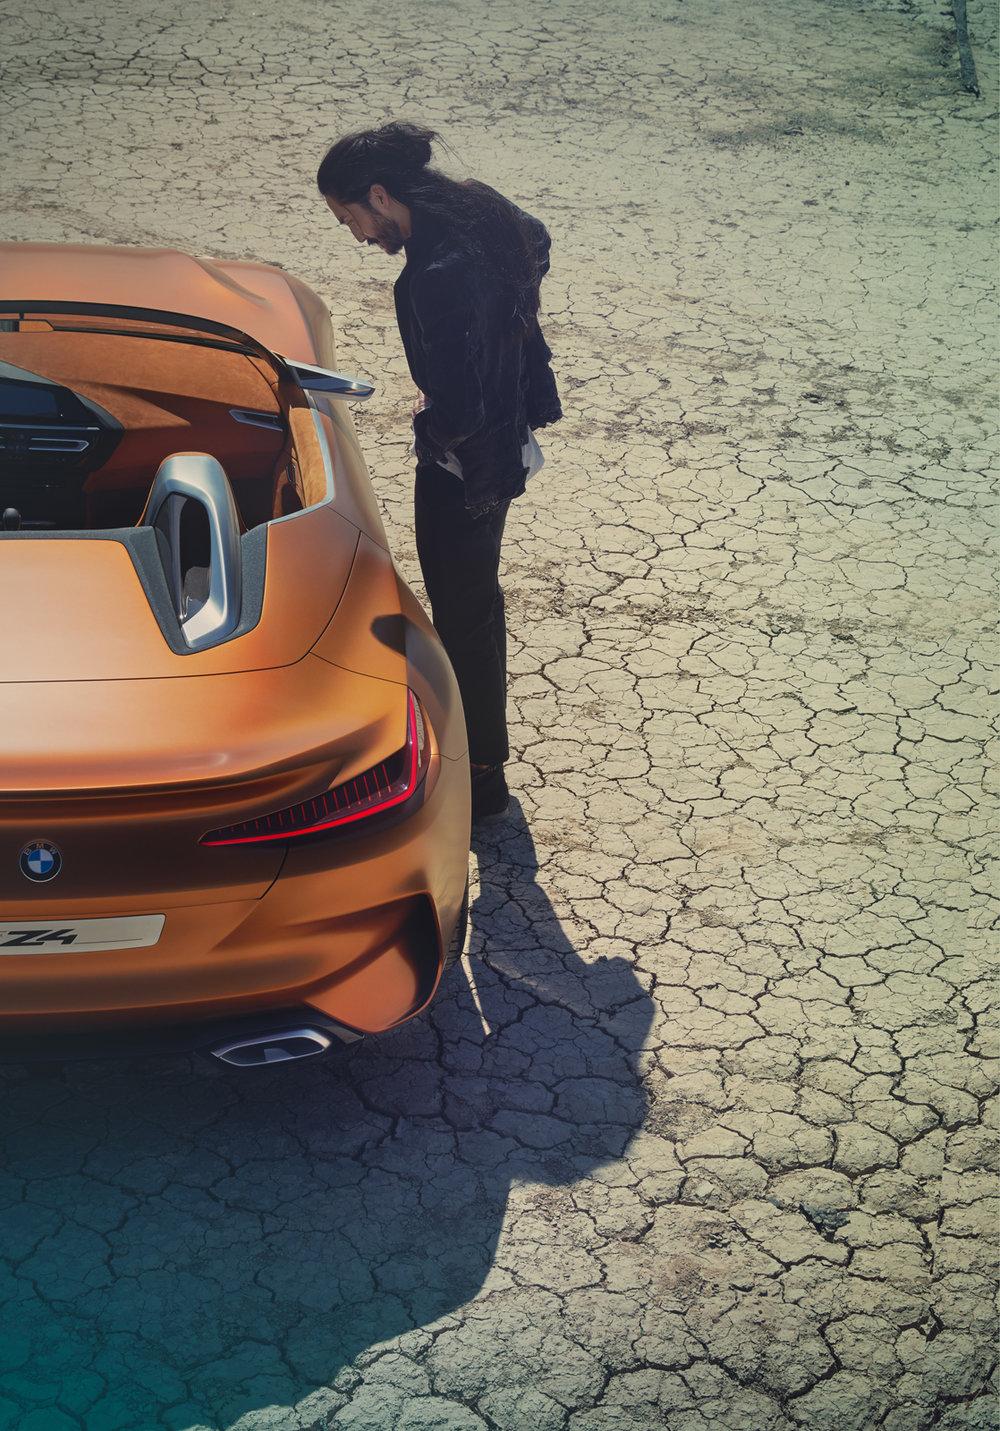 BMW_DCC070_19.jpg